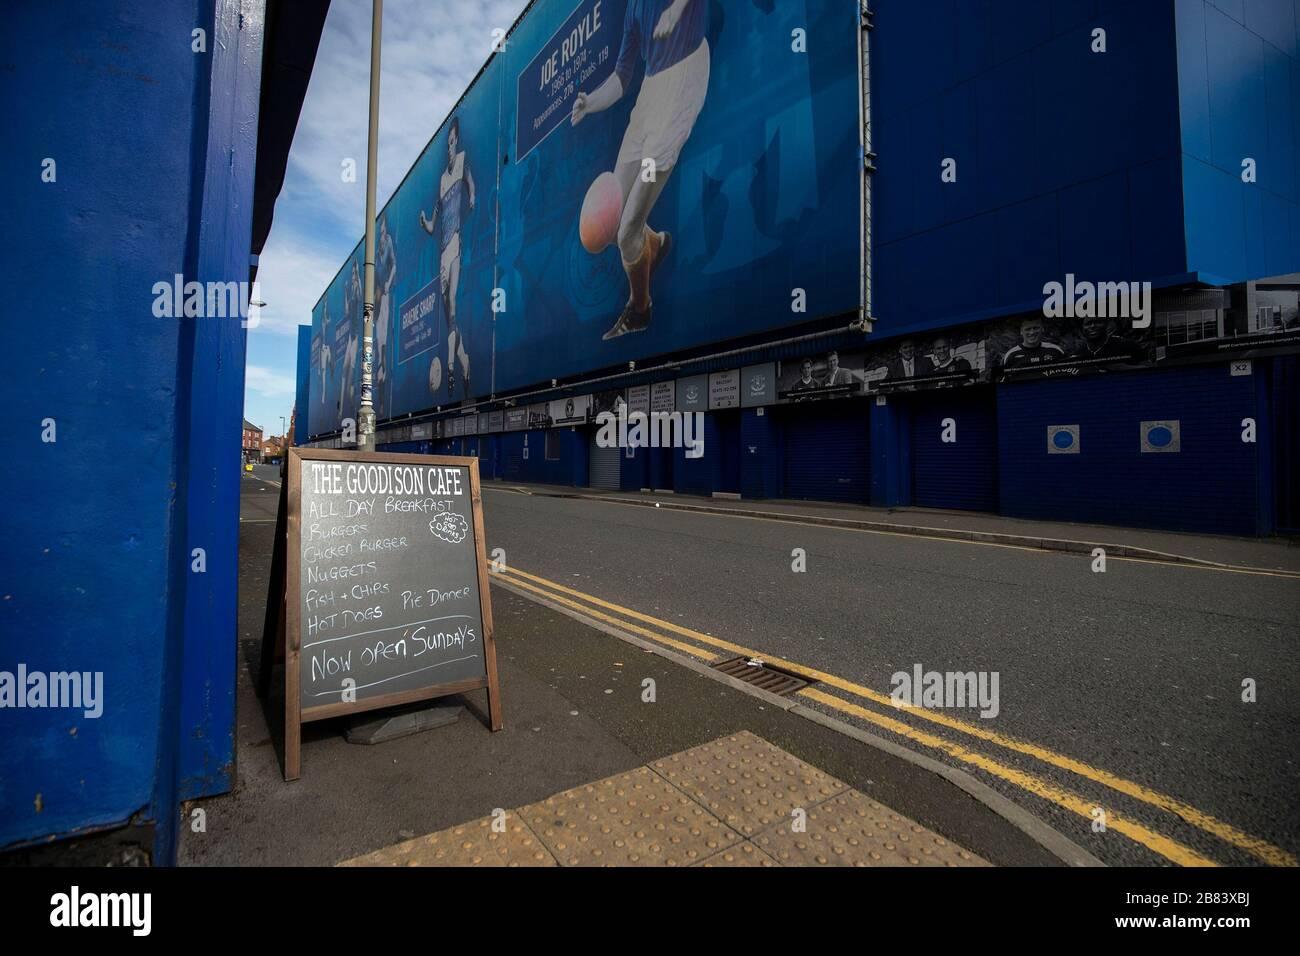 Everton Football club and surrounding business during the Coronavirus outbreak Stock Photo